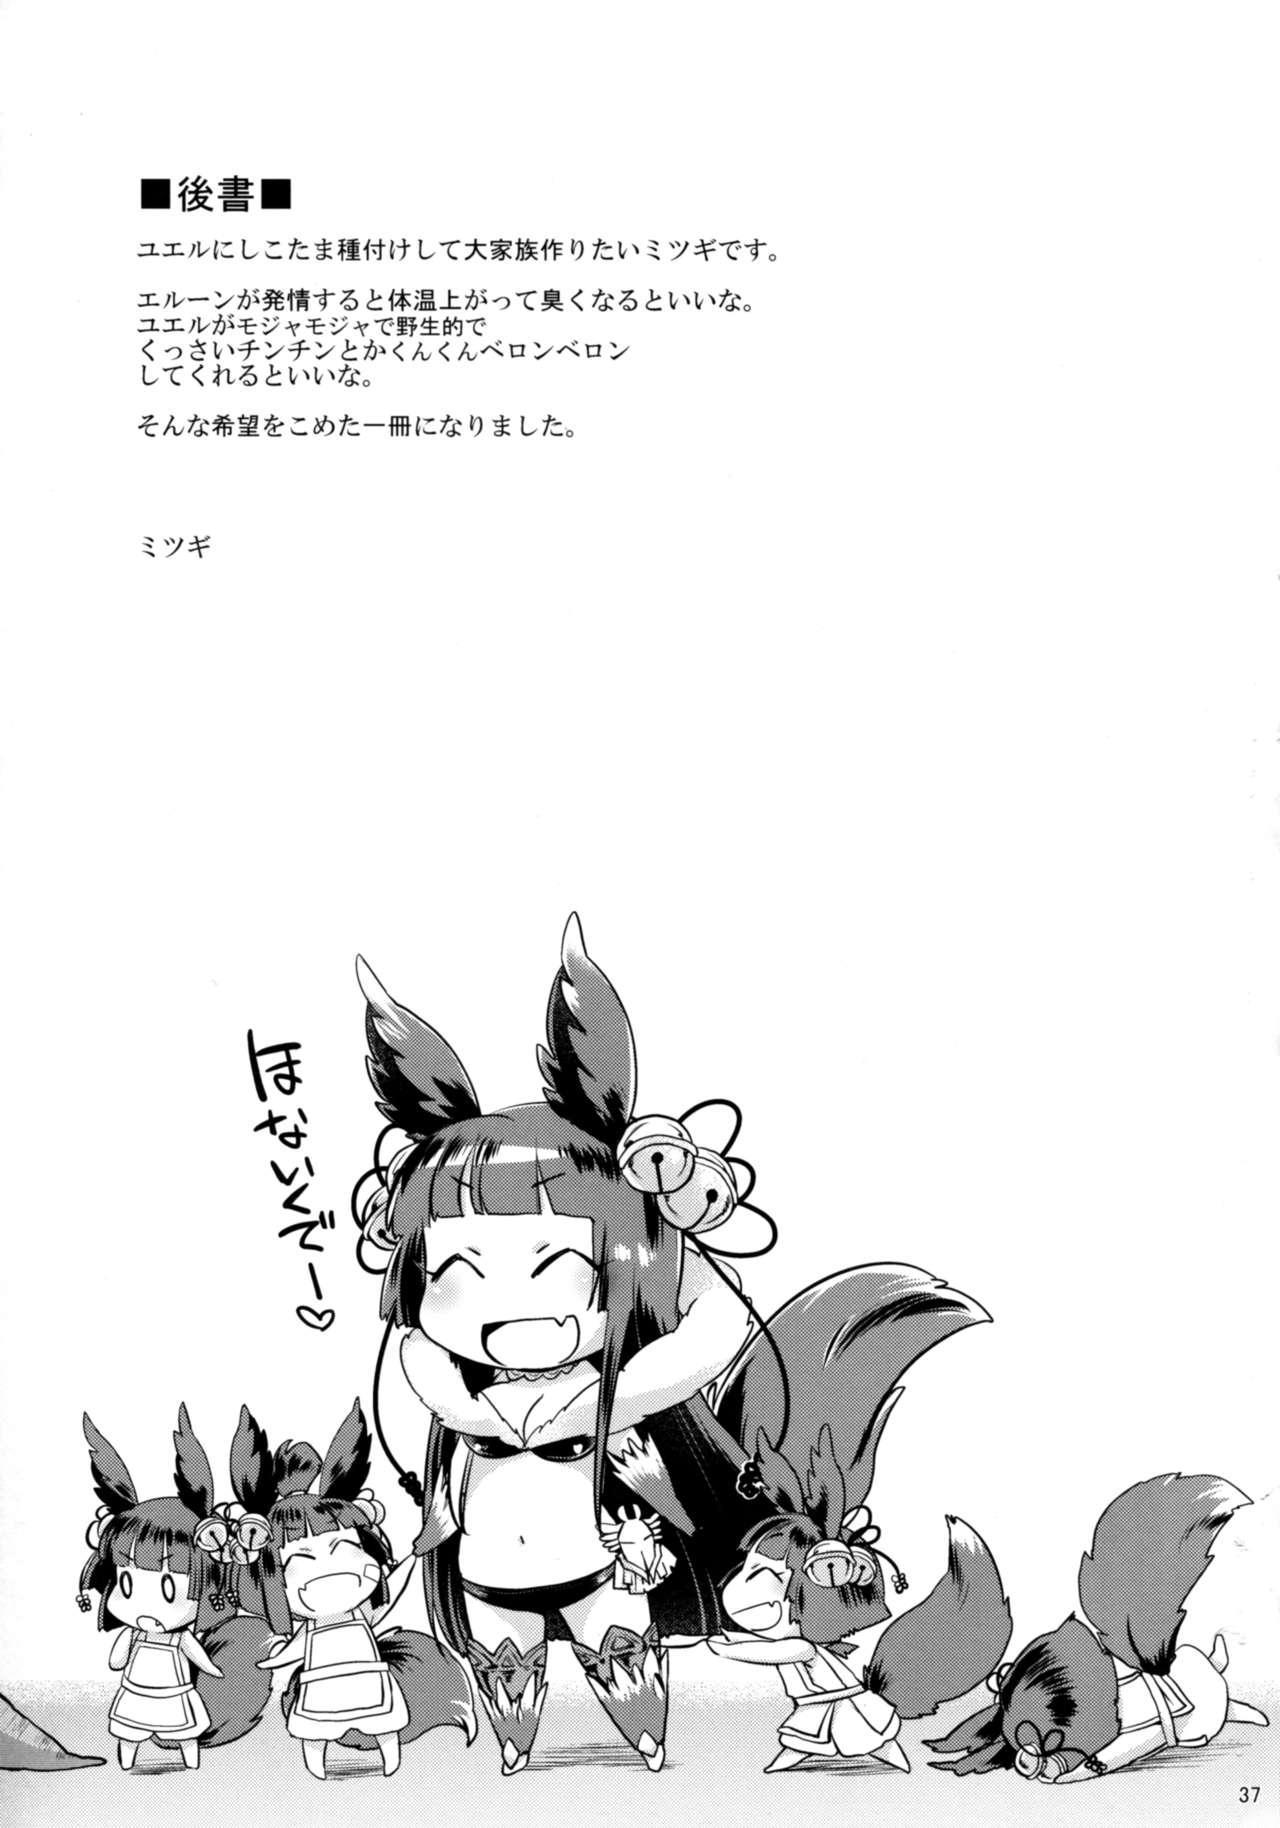 Kyou no Yuel | Today's Yuel 36